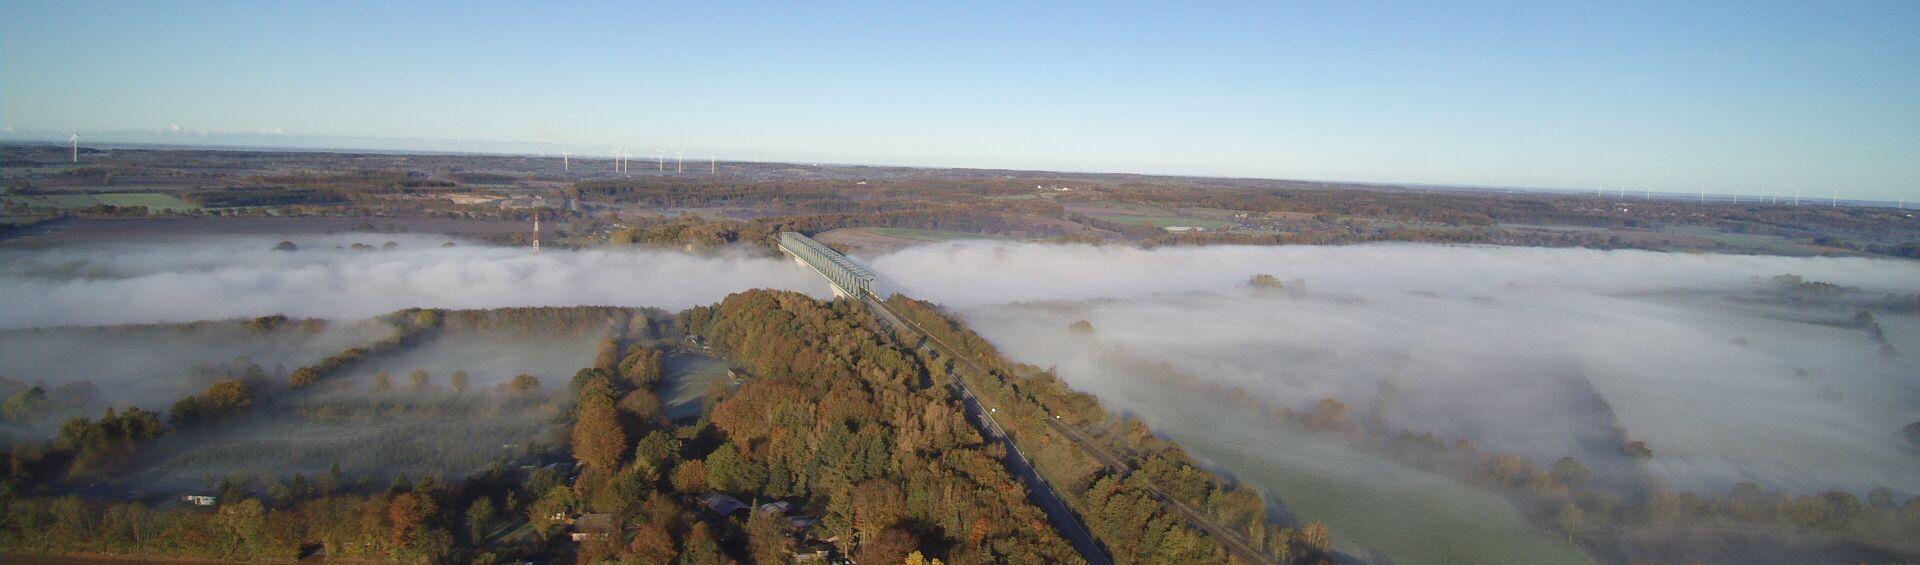 NOK im Nebel